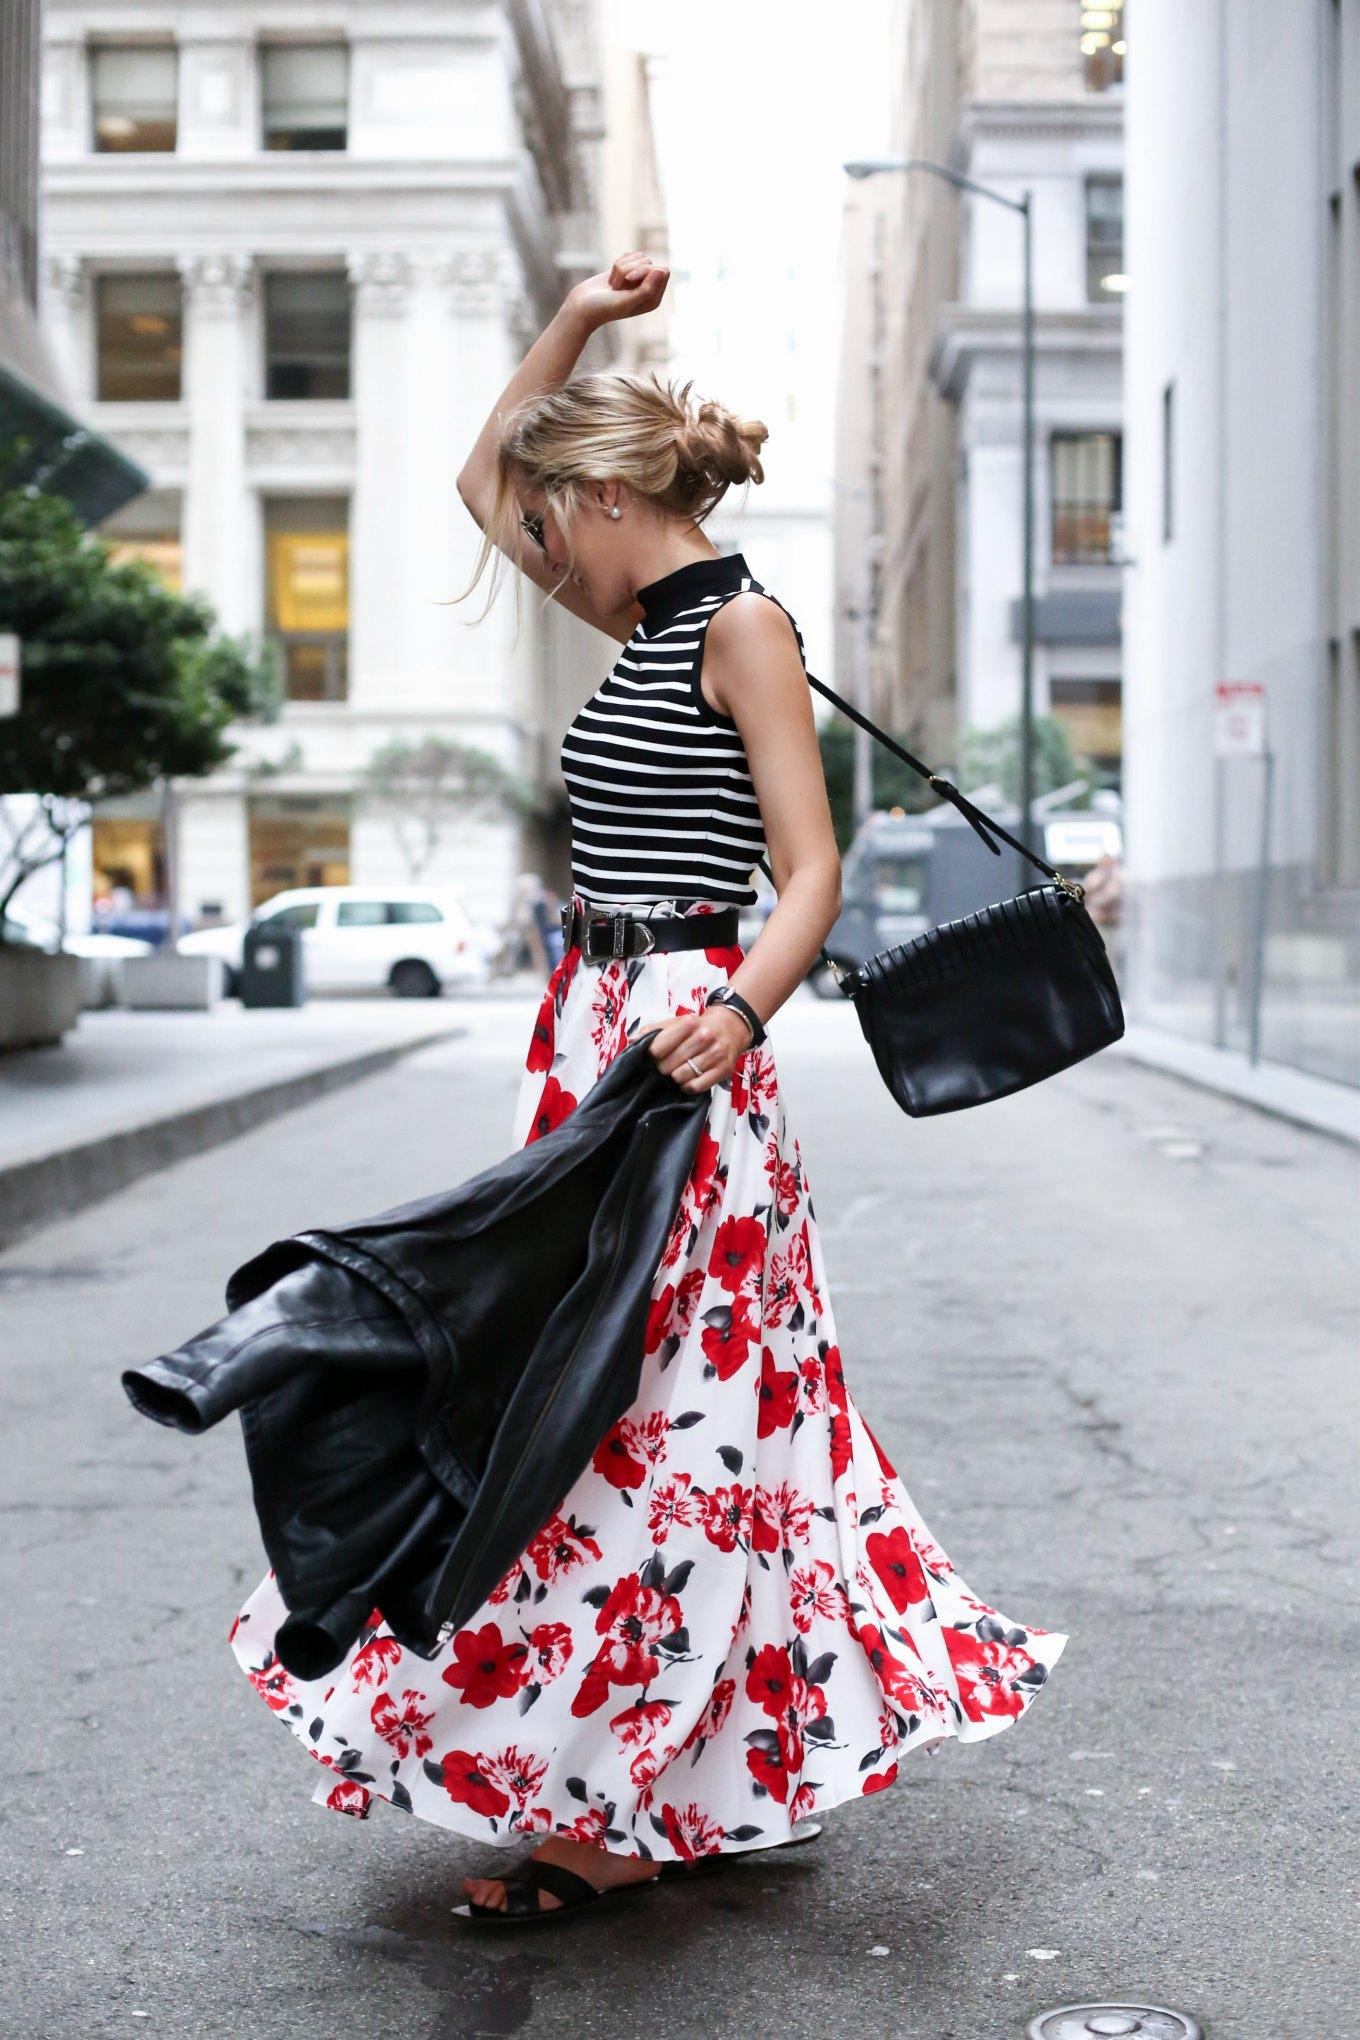 red-white-floral-nasty-gal-maxi-skirt-black-white-striped-sleeveless-turtleneck-cross-slide-sandals-mary-orton-memorandum-san-francisco-style-fashion-blog9-680x10202x